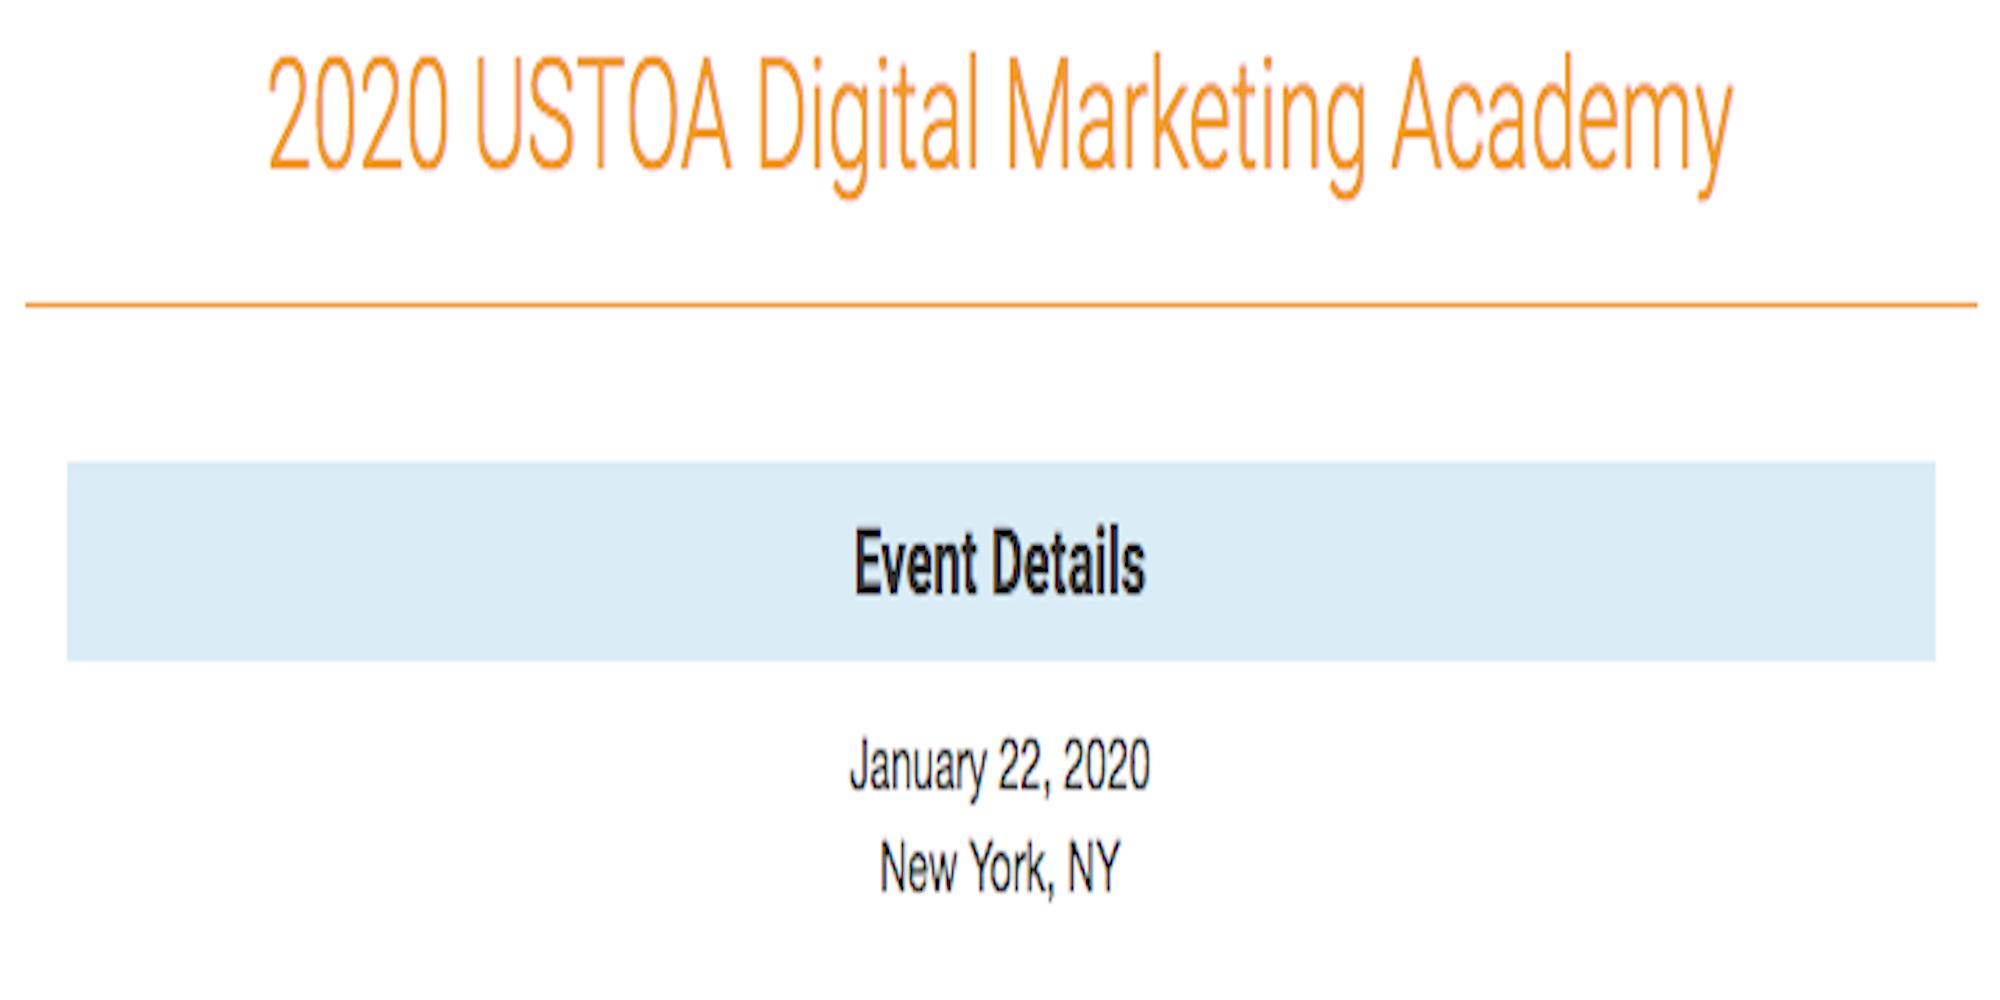 USTOA Digital Marketing Academy